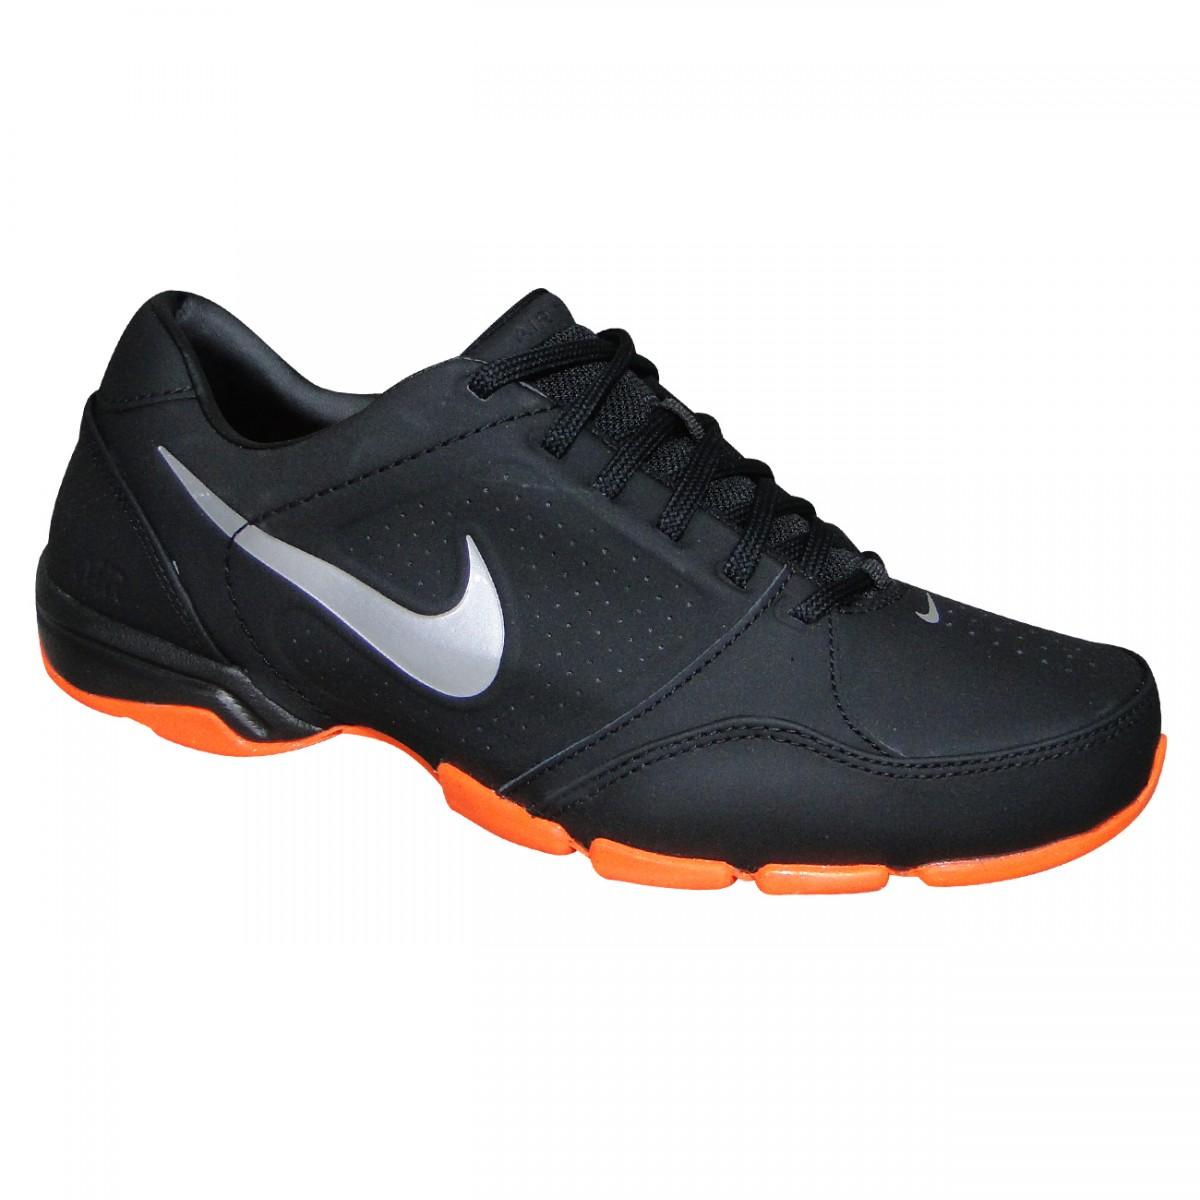 d6de12122a0cf Tenis Nike Air Toukol III 525726 015 - PRETO/PRATA/LARANJA ...